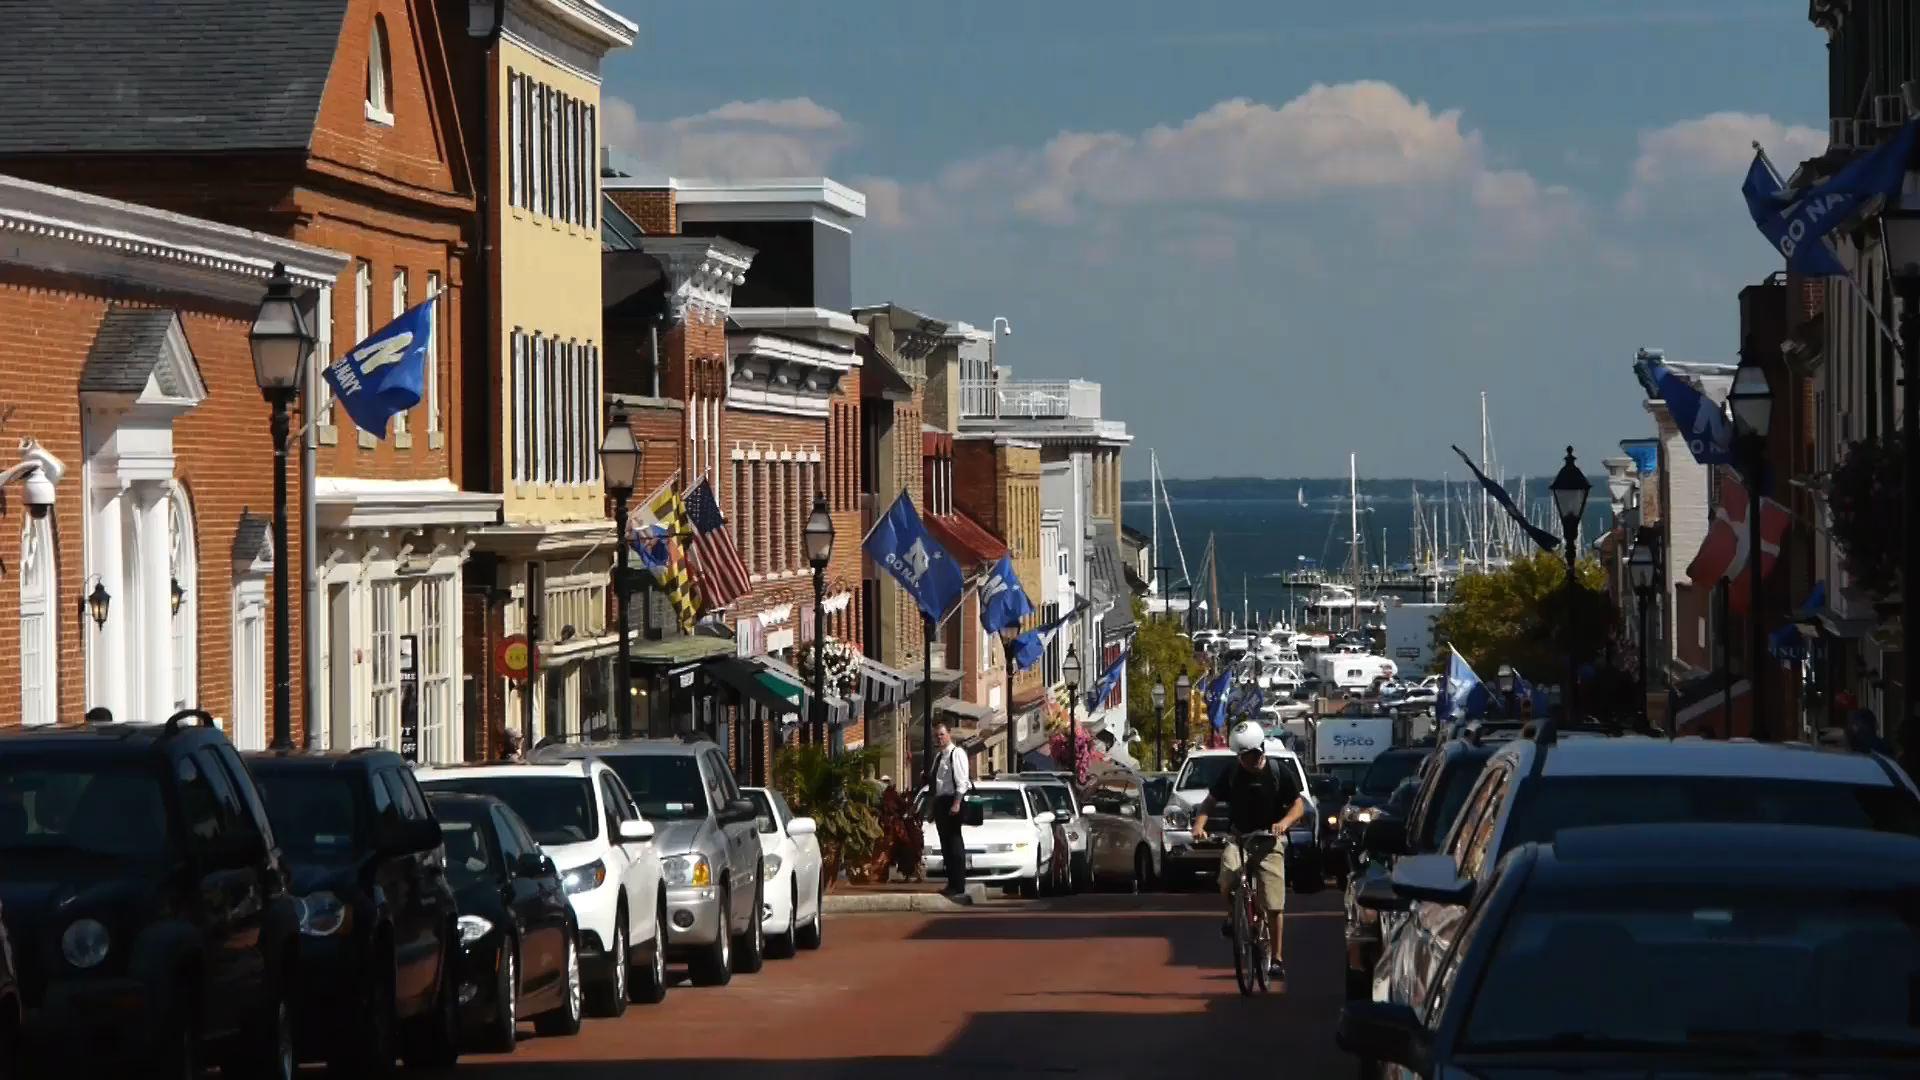 Location Horn Point Harbor Marina Annapolis Maryland